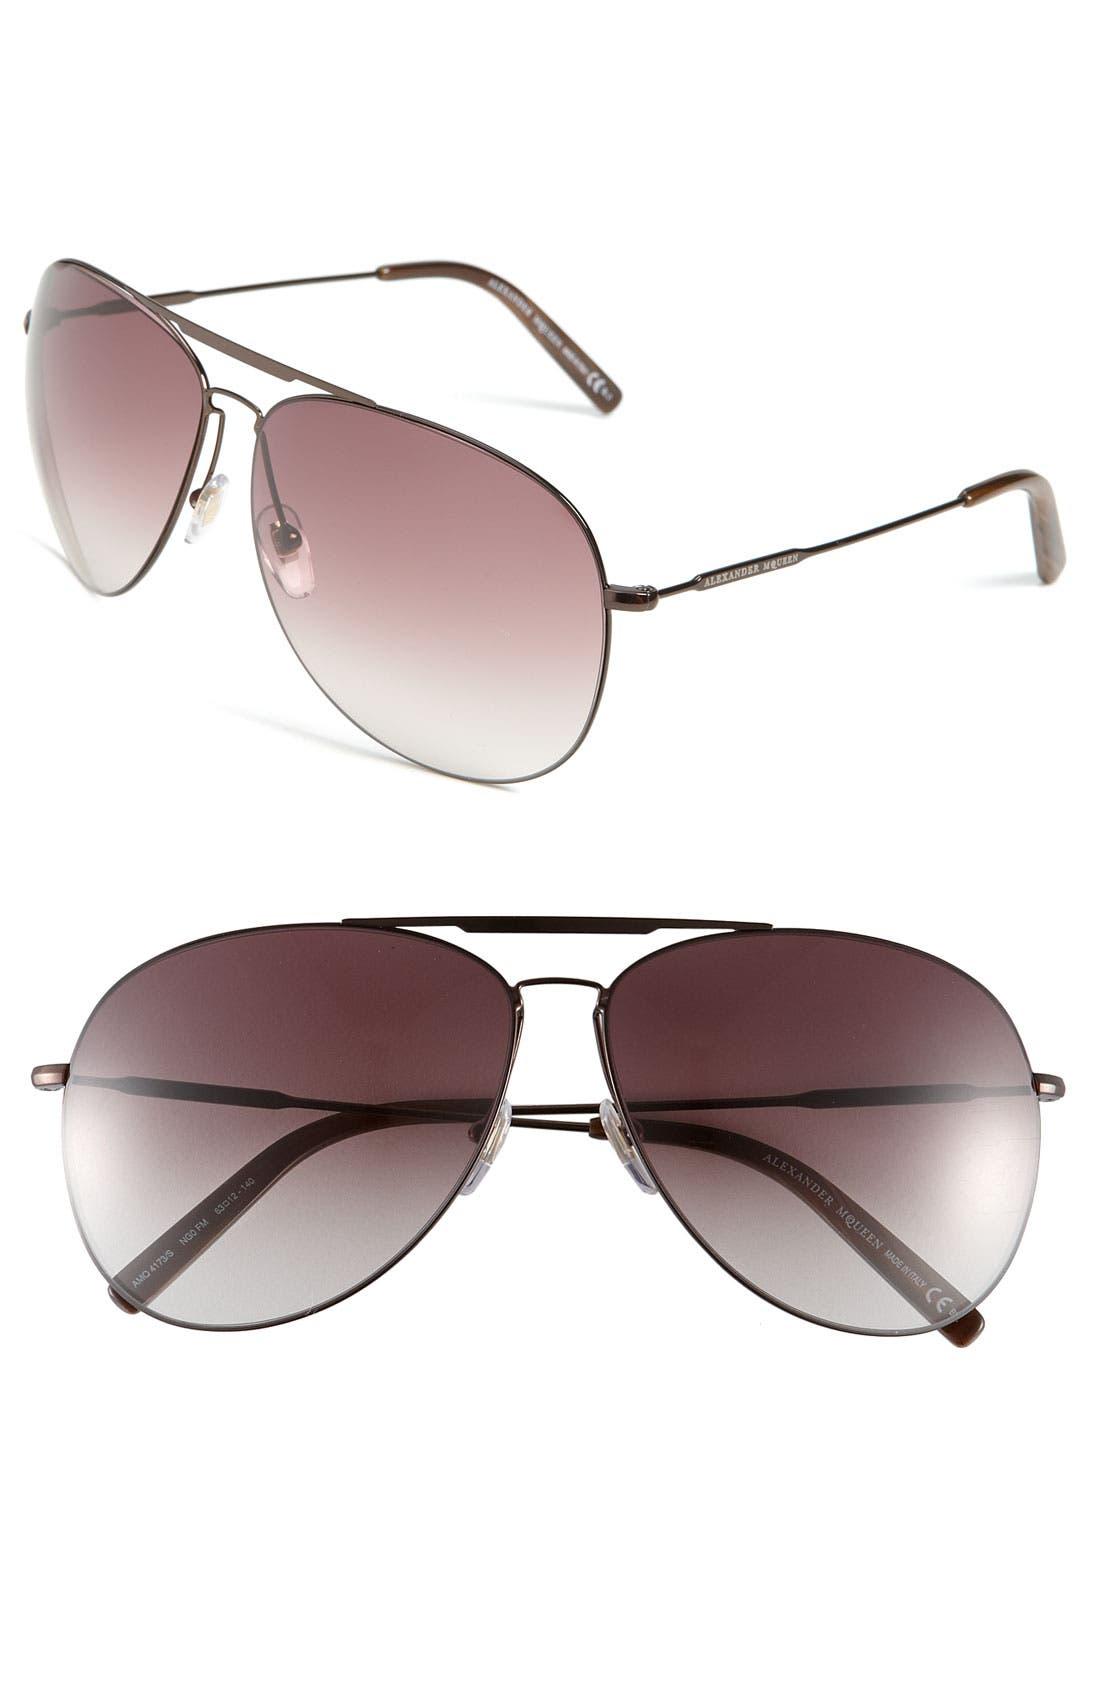 Alternate Image 1 Selected - Alexander McQueen Metal Aviator Sunglasses